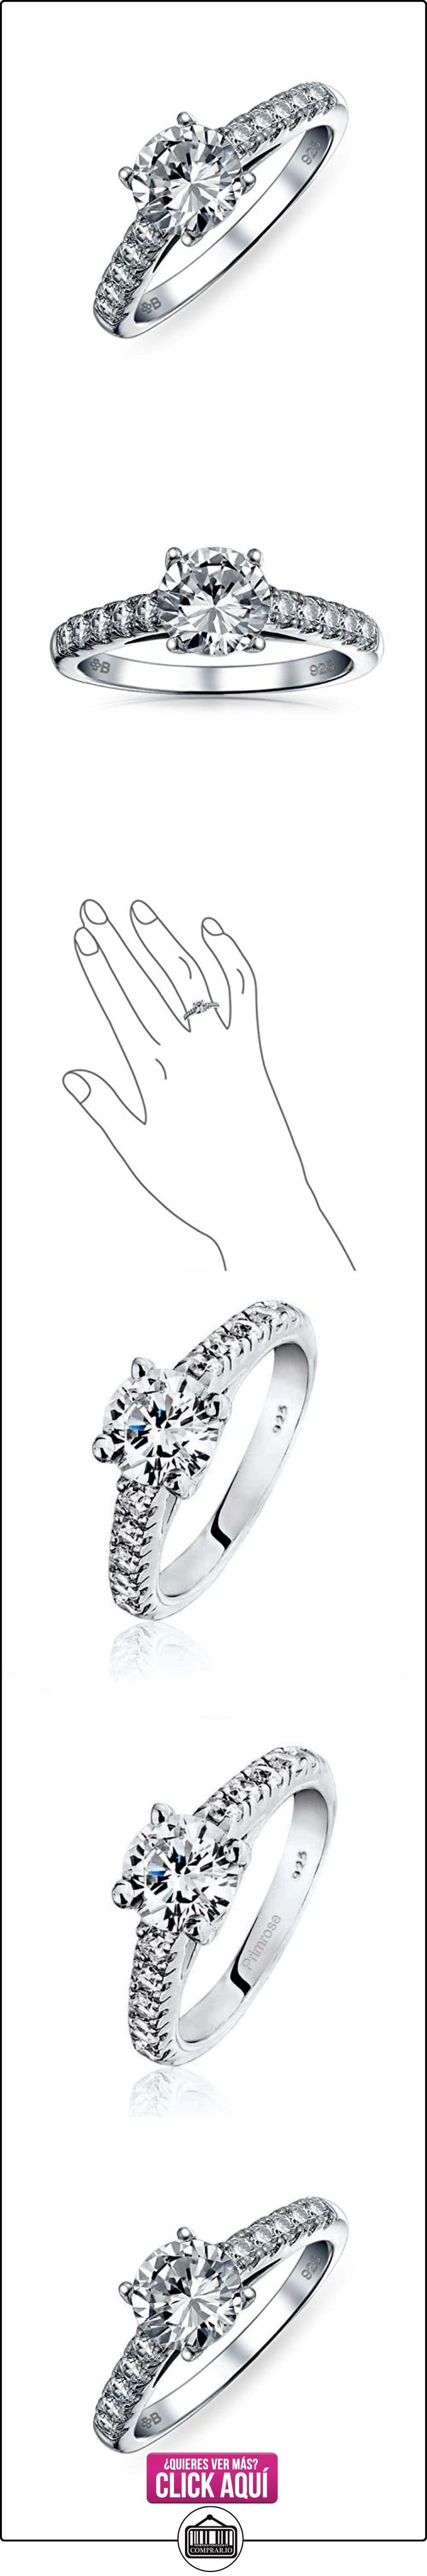 Bling Jewelry Plata Esterlina Allanar CZ redondo Solitario Anillo de Compromiso  ✿ Joyas para mujer - Las mejores ofertas ✿ ▬► Ver oferta: https://comprar.io/goto/B002XCMJGG